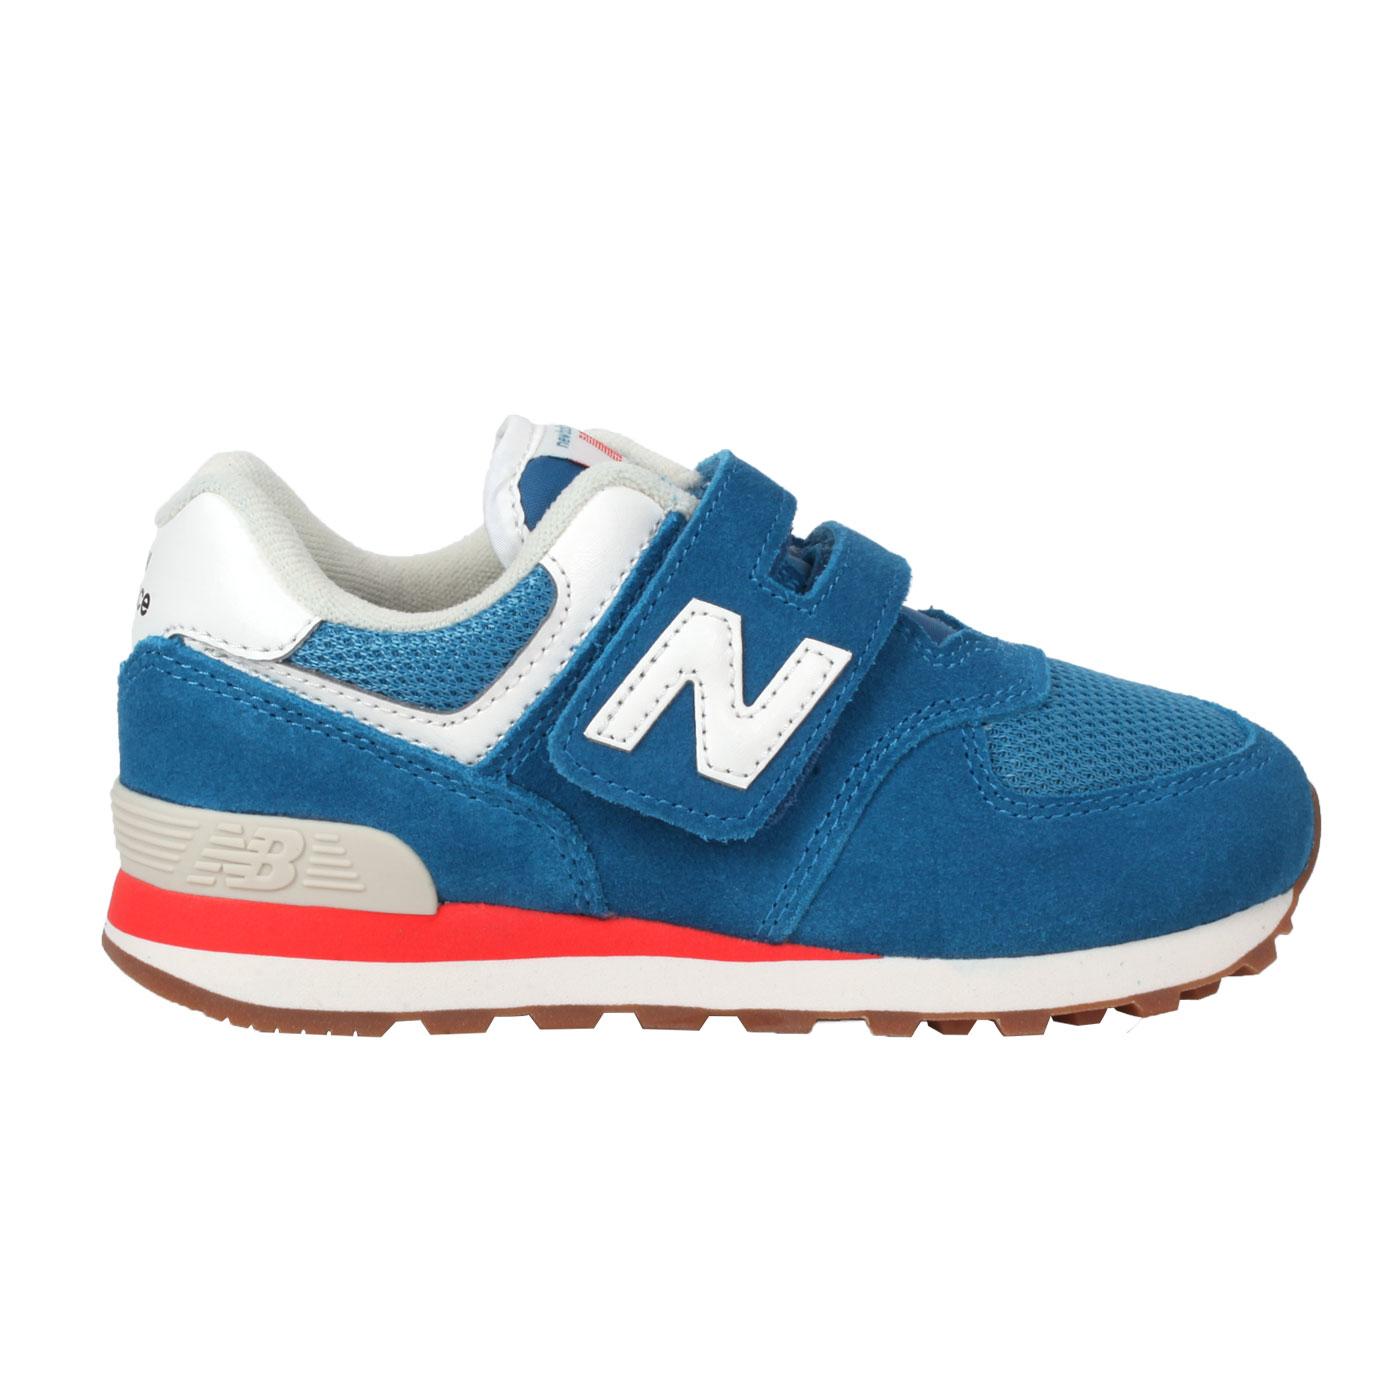 NEW BALANCE 中童休閒運動鞋-WIDE PV574HC2 - 藍白紅